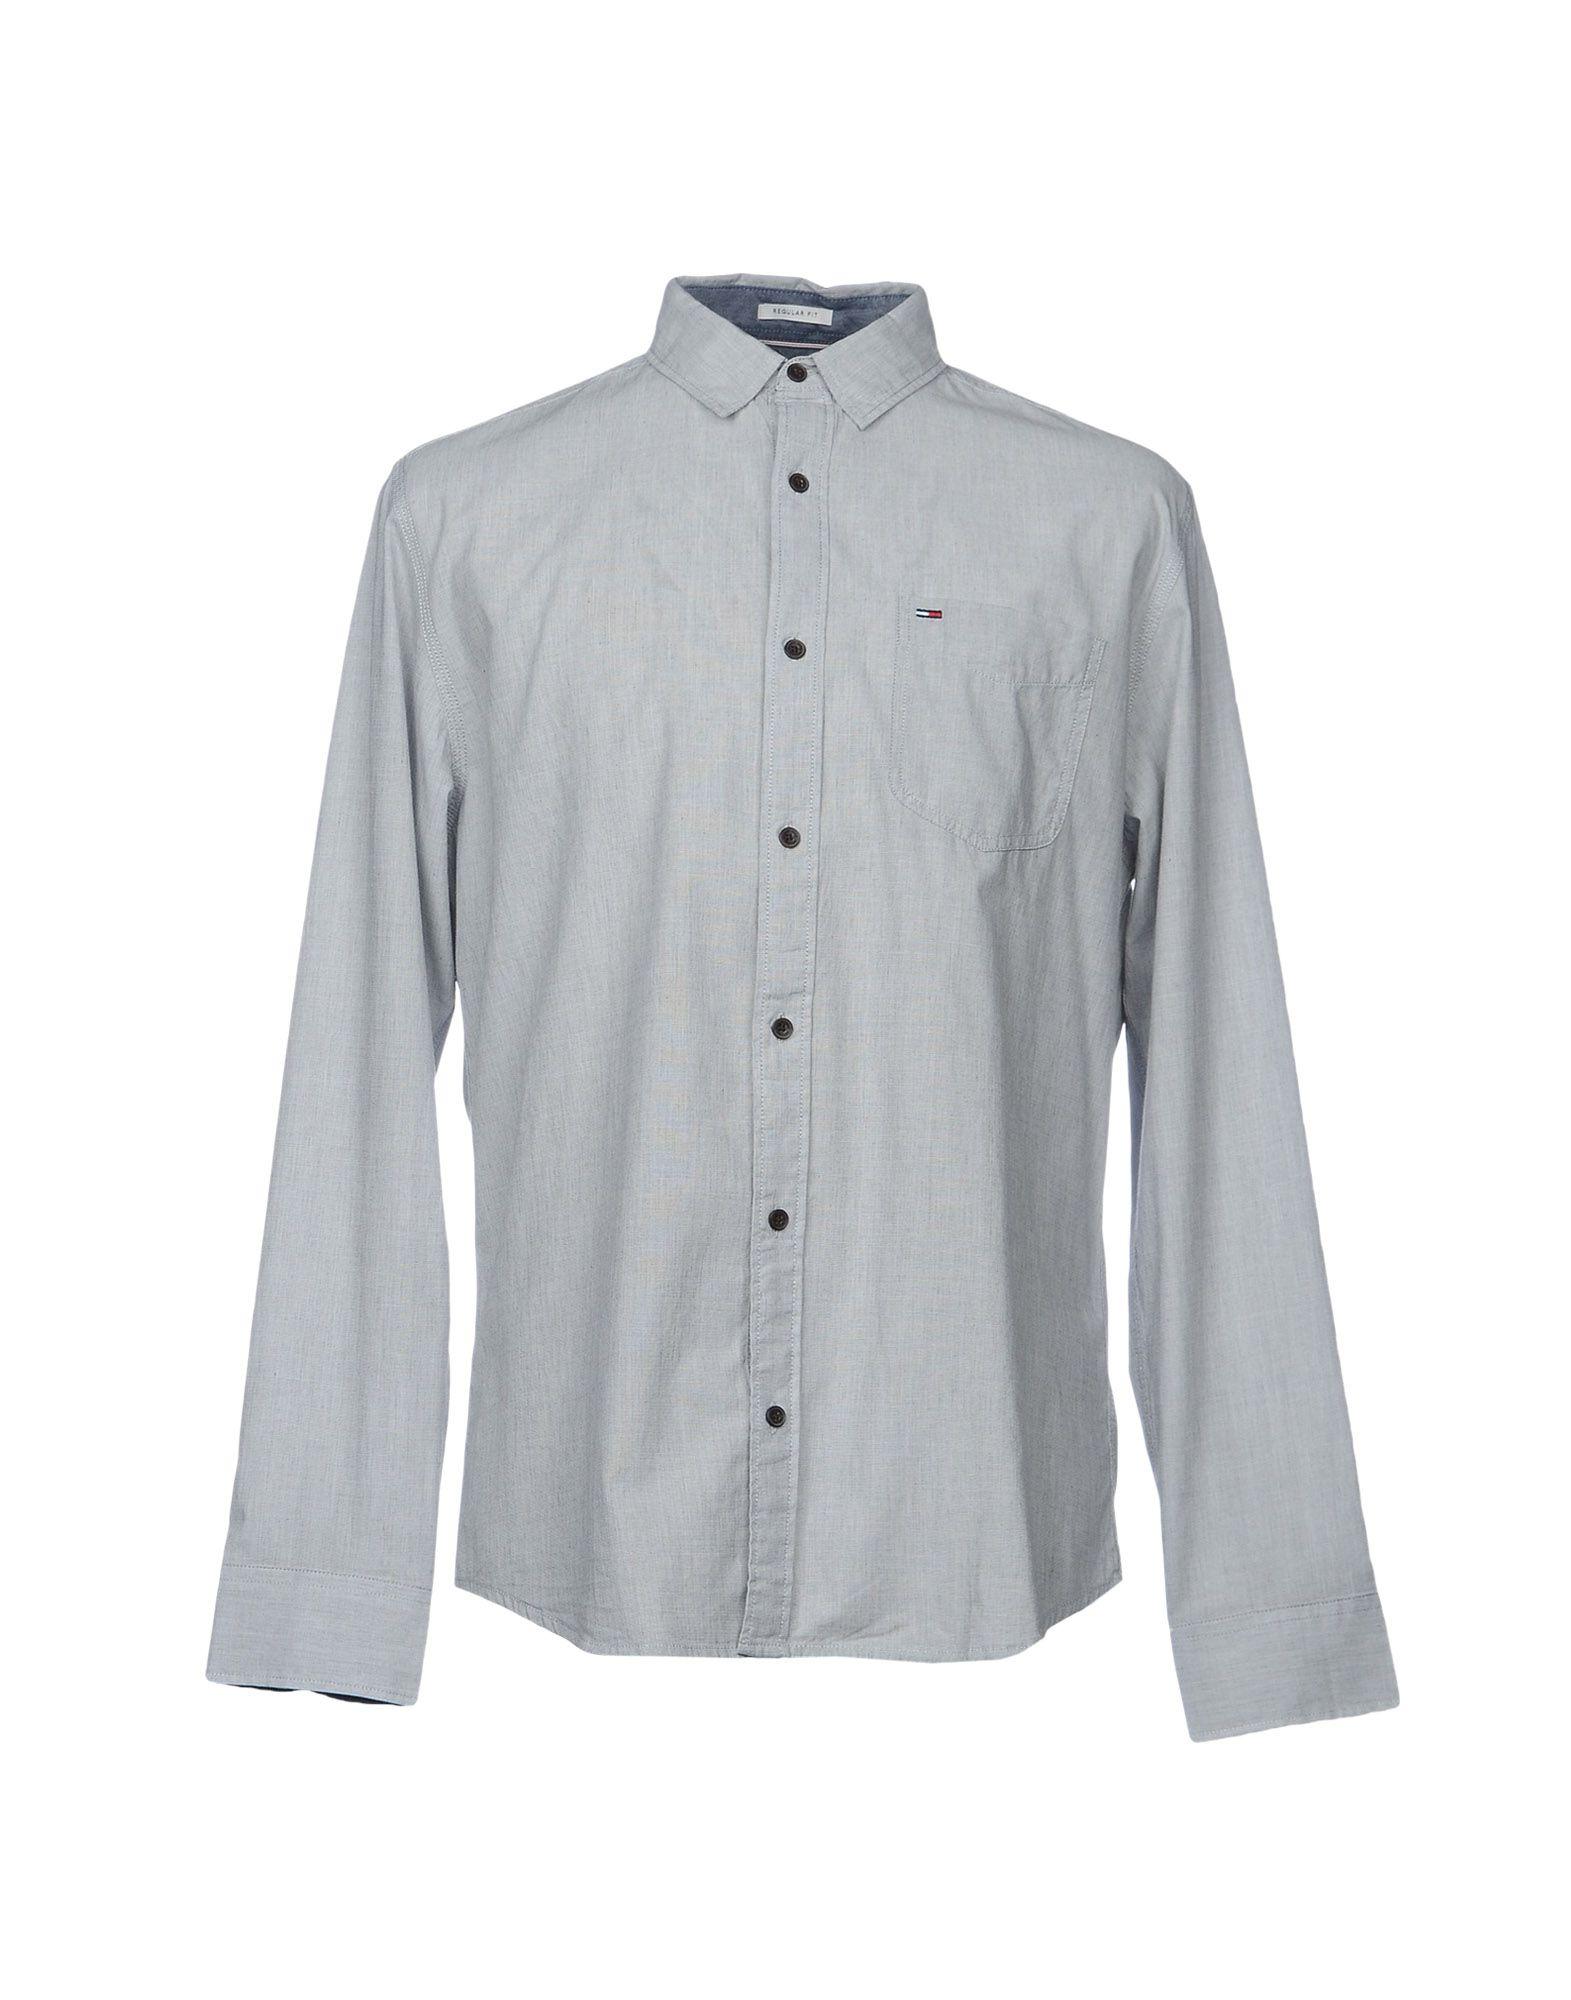 TOMMY HILFIGER DENIM Pубашка футболка tommy hilfiger denim tommy hilfiger denim to013ewtpb98